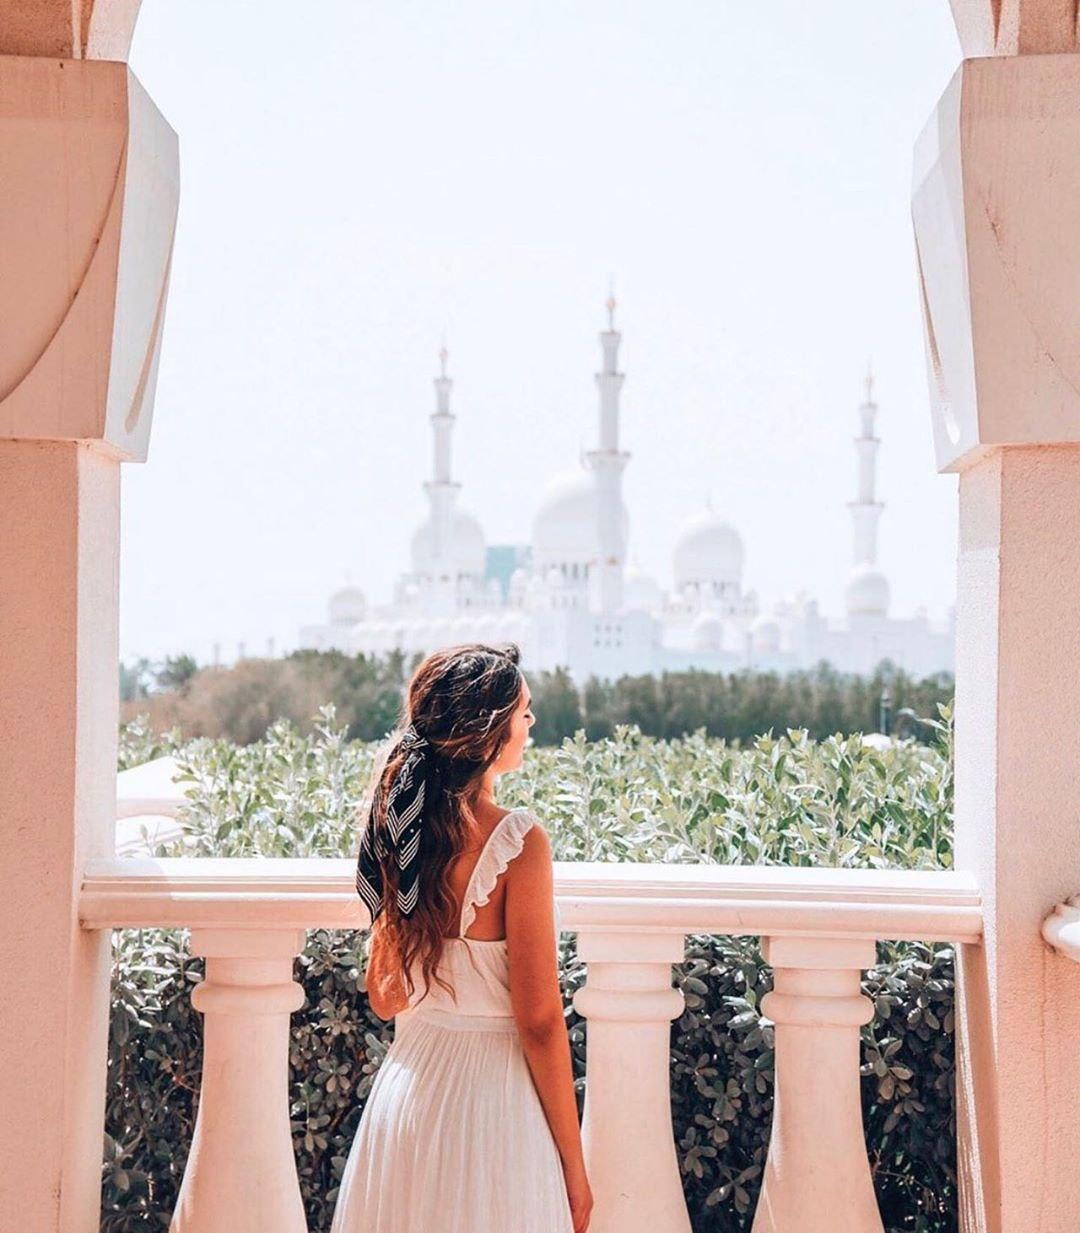 UAE, ОАЭ, Sparkle Travel